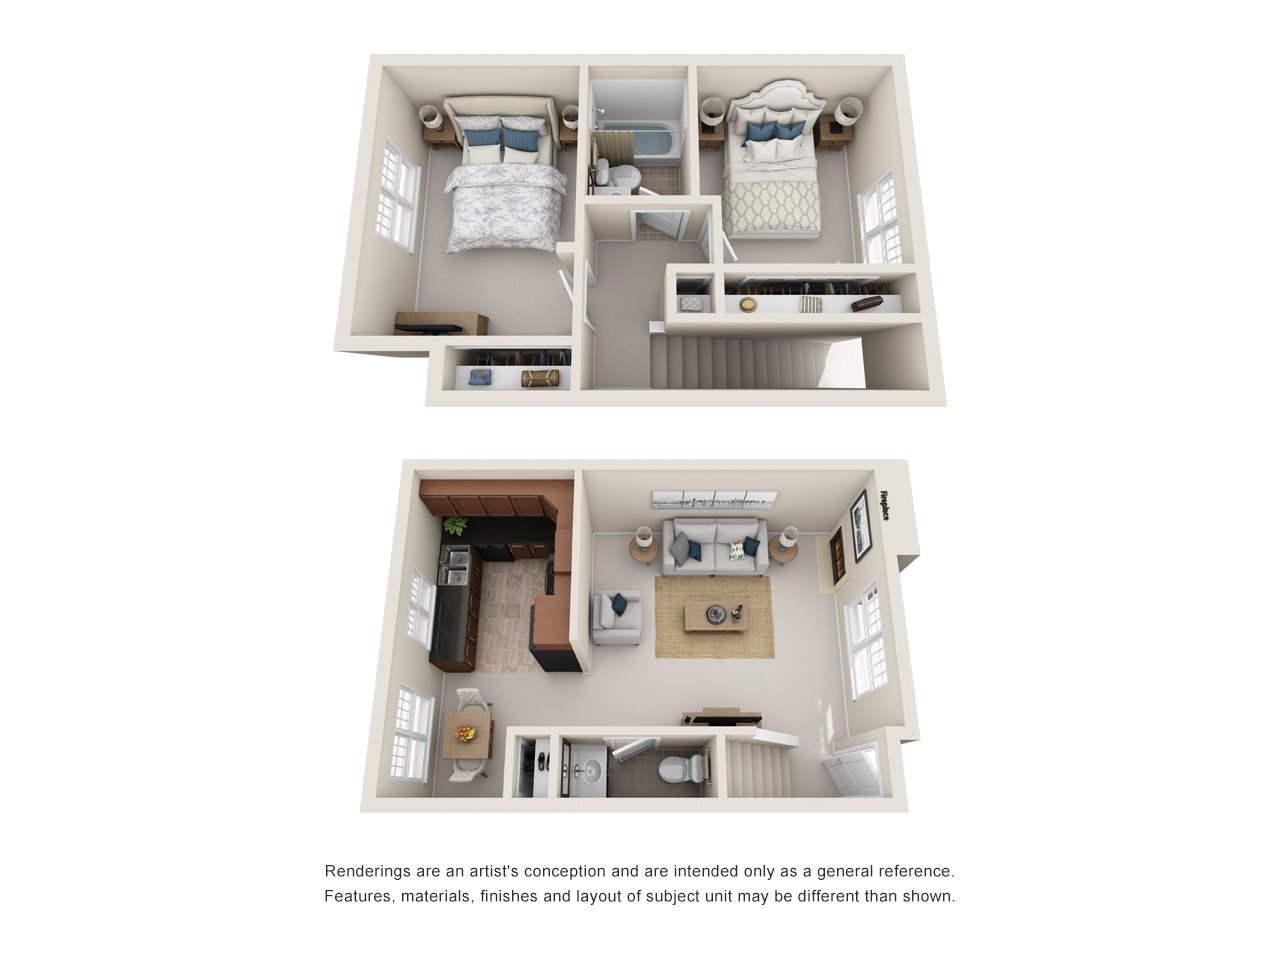 2.1.5a Floor Plan 1